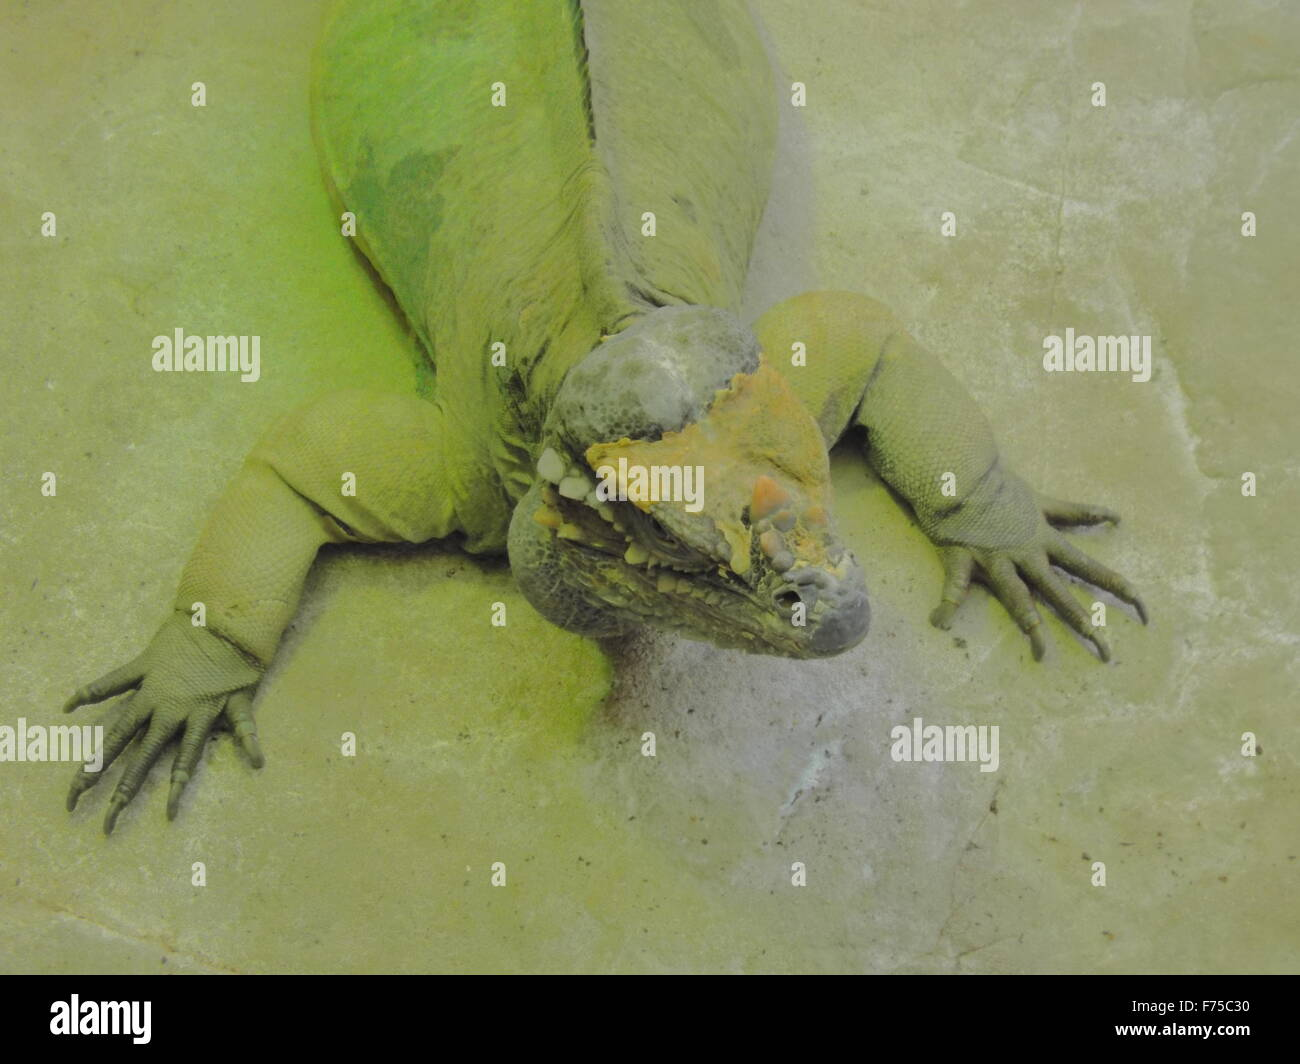 lizard face - Stock Image